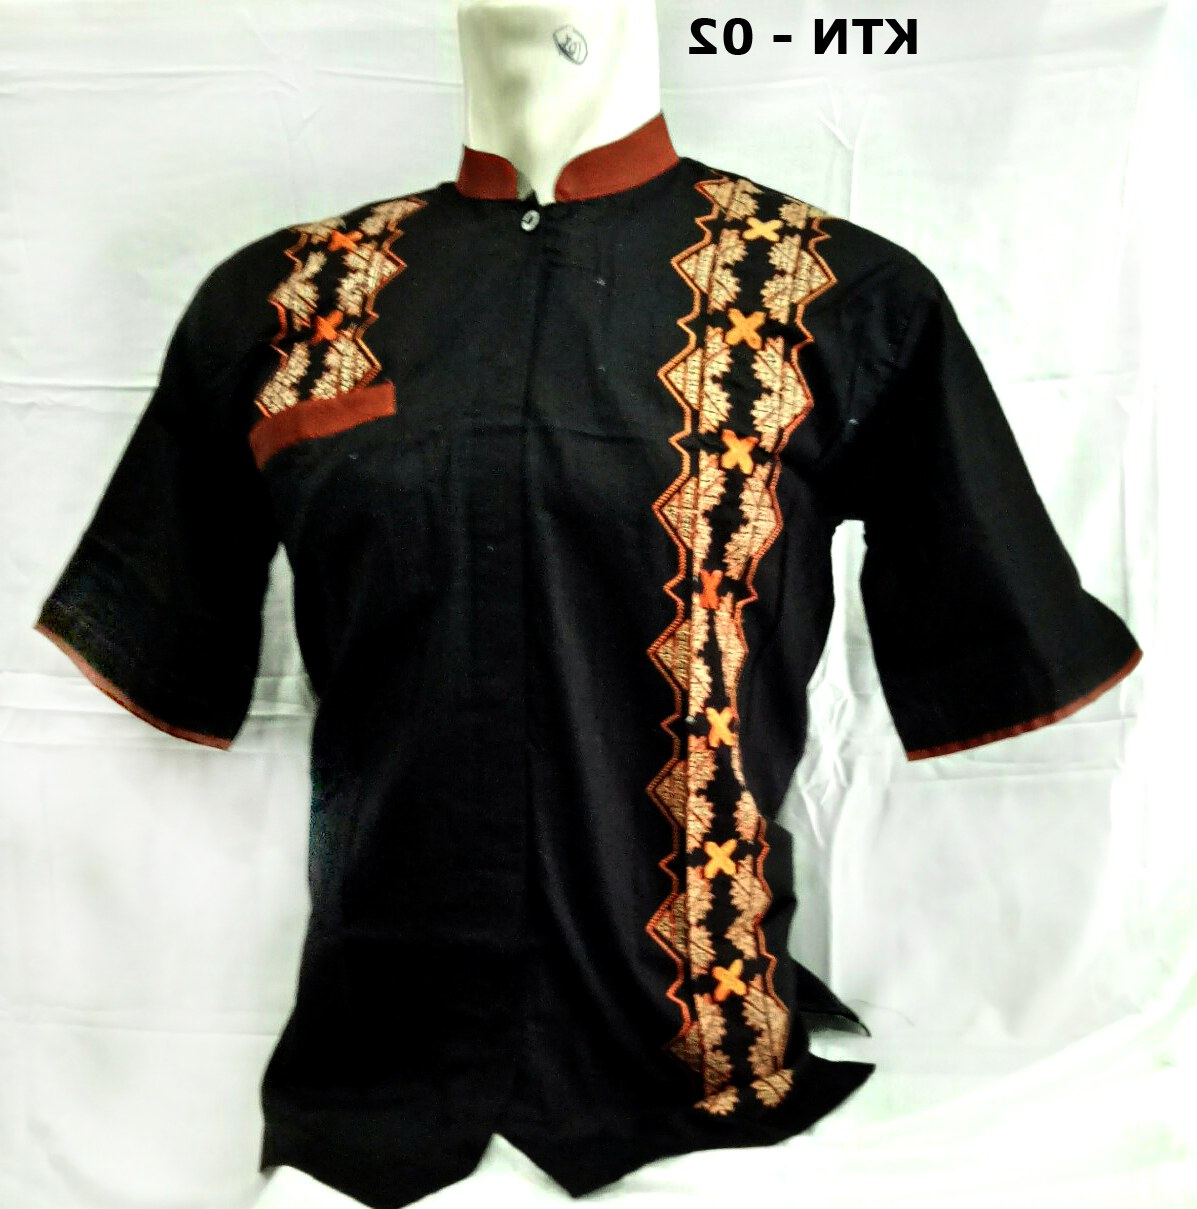 Ide Baju Lebaran Warna Hitam 9ddf Model Baju Koko Terbaru Lebaran 2018 Lengan Pendek Murah